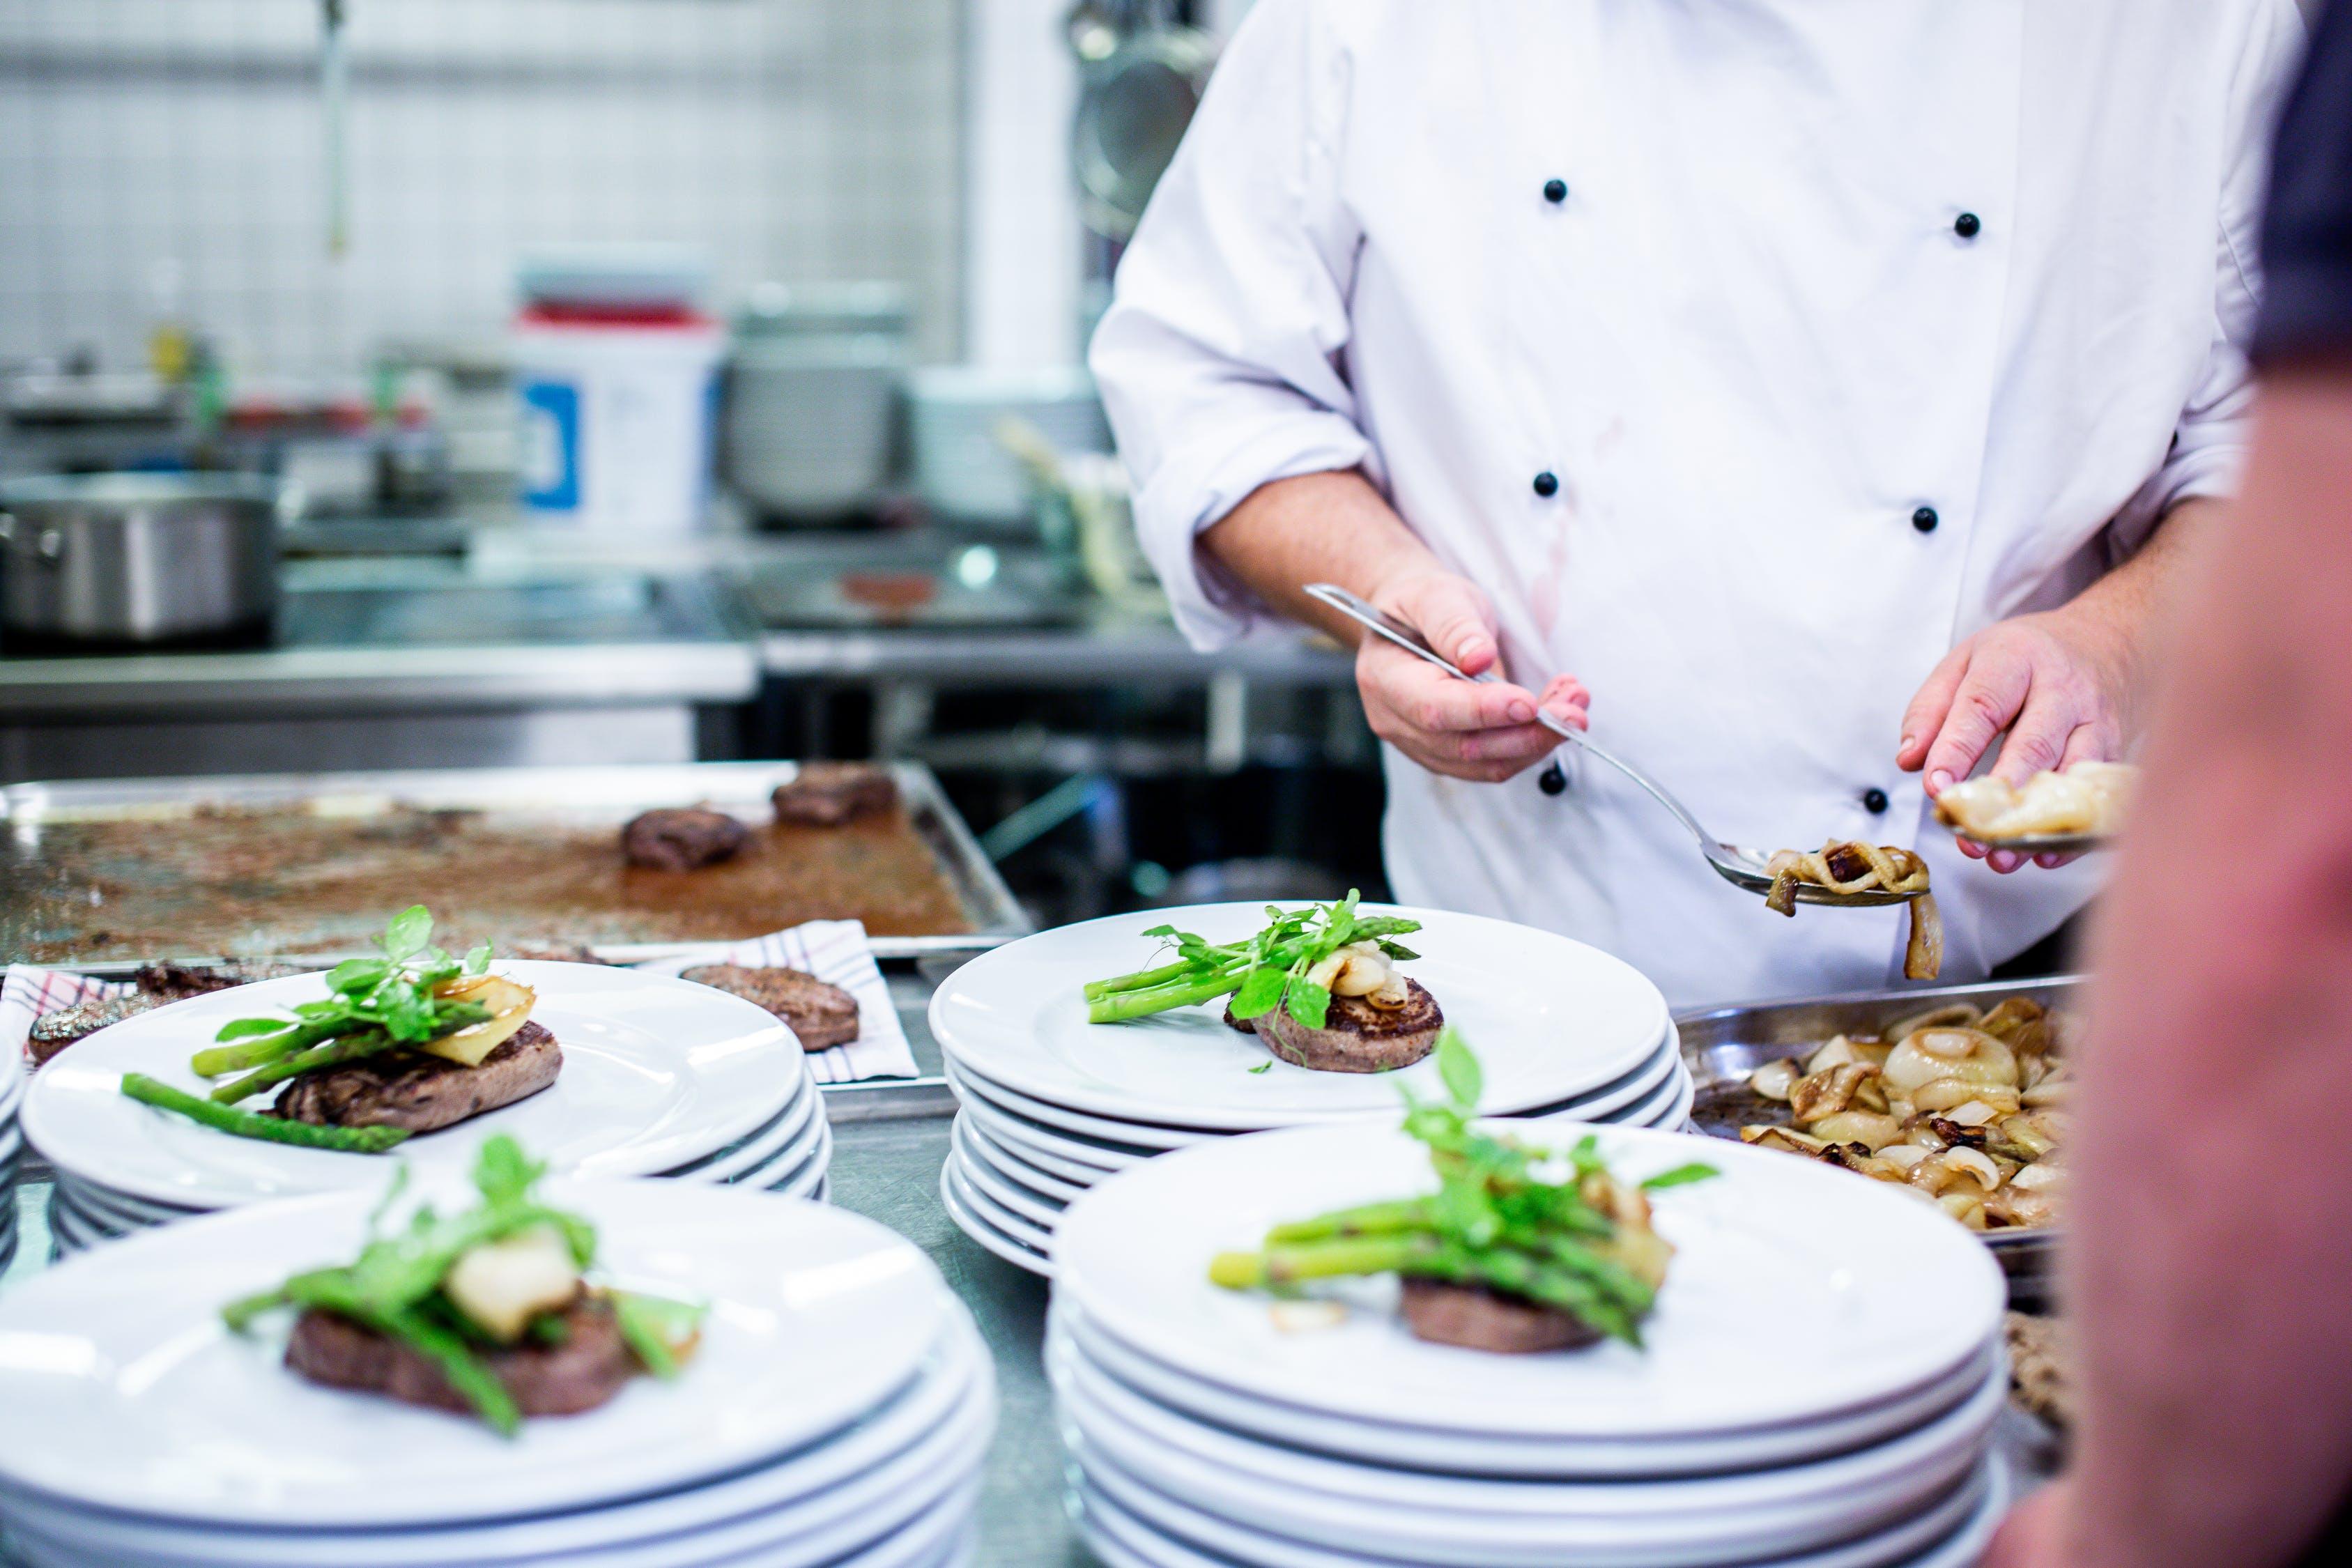 chef, plates, food